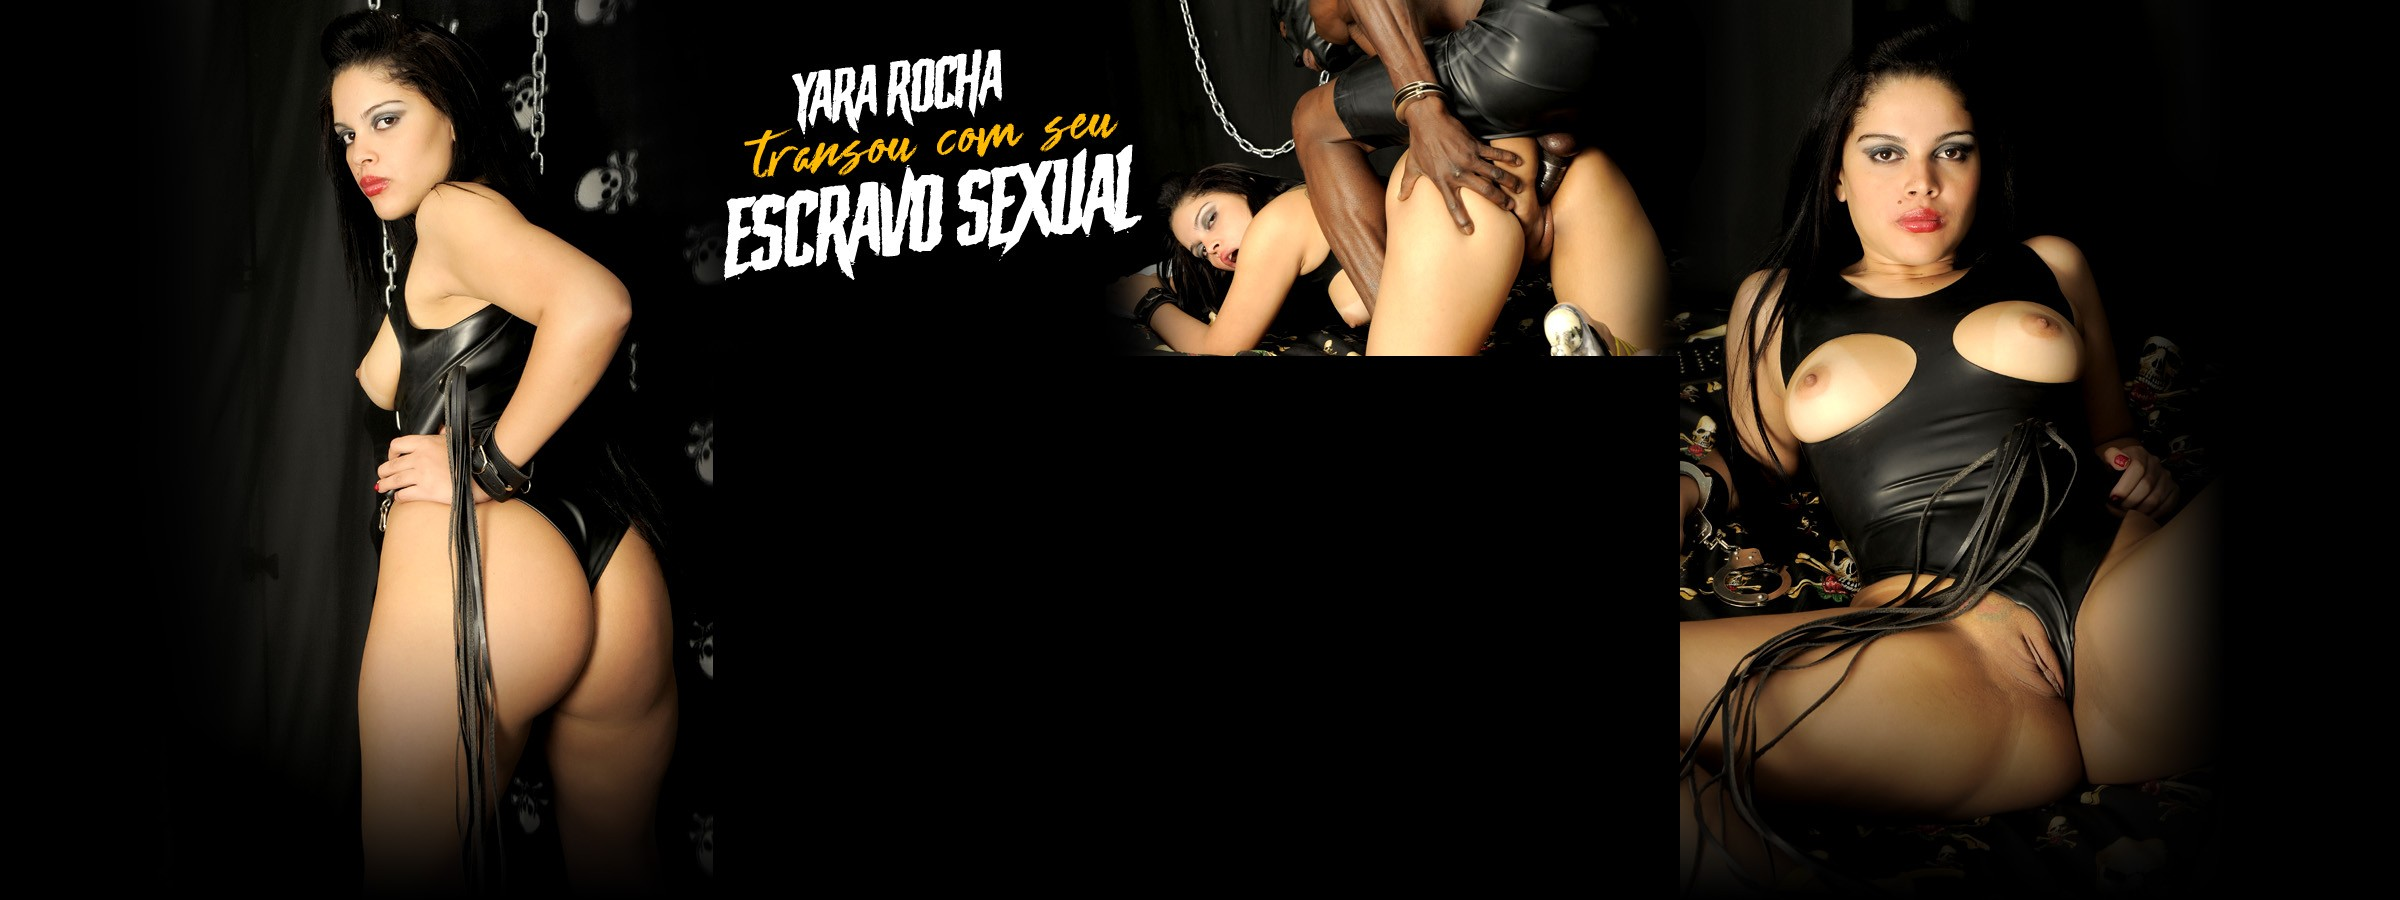 Yara Rocha transou com seu escravo sexual